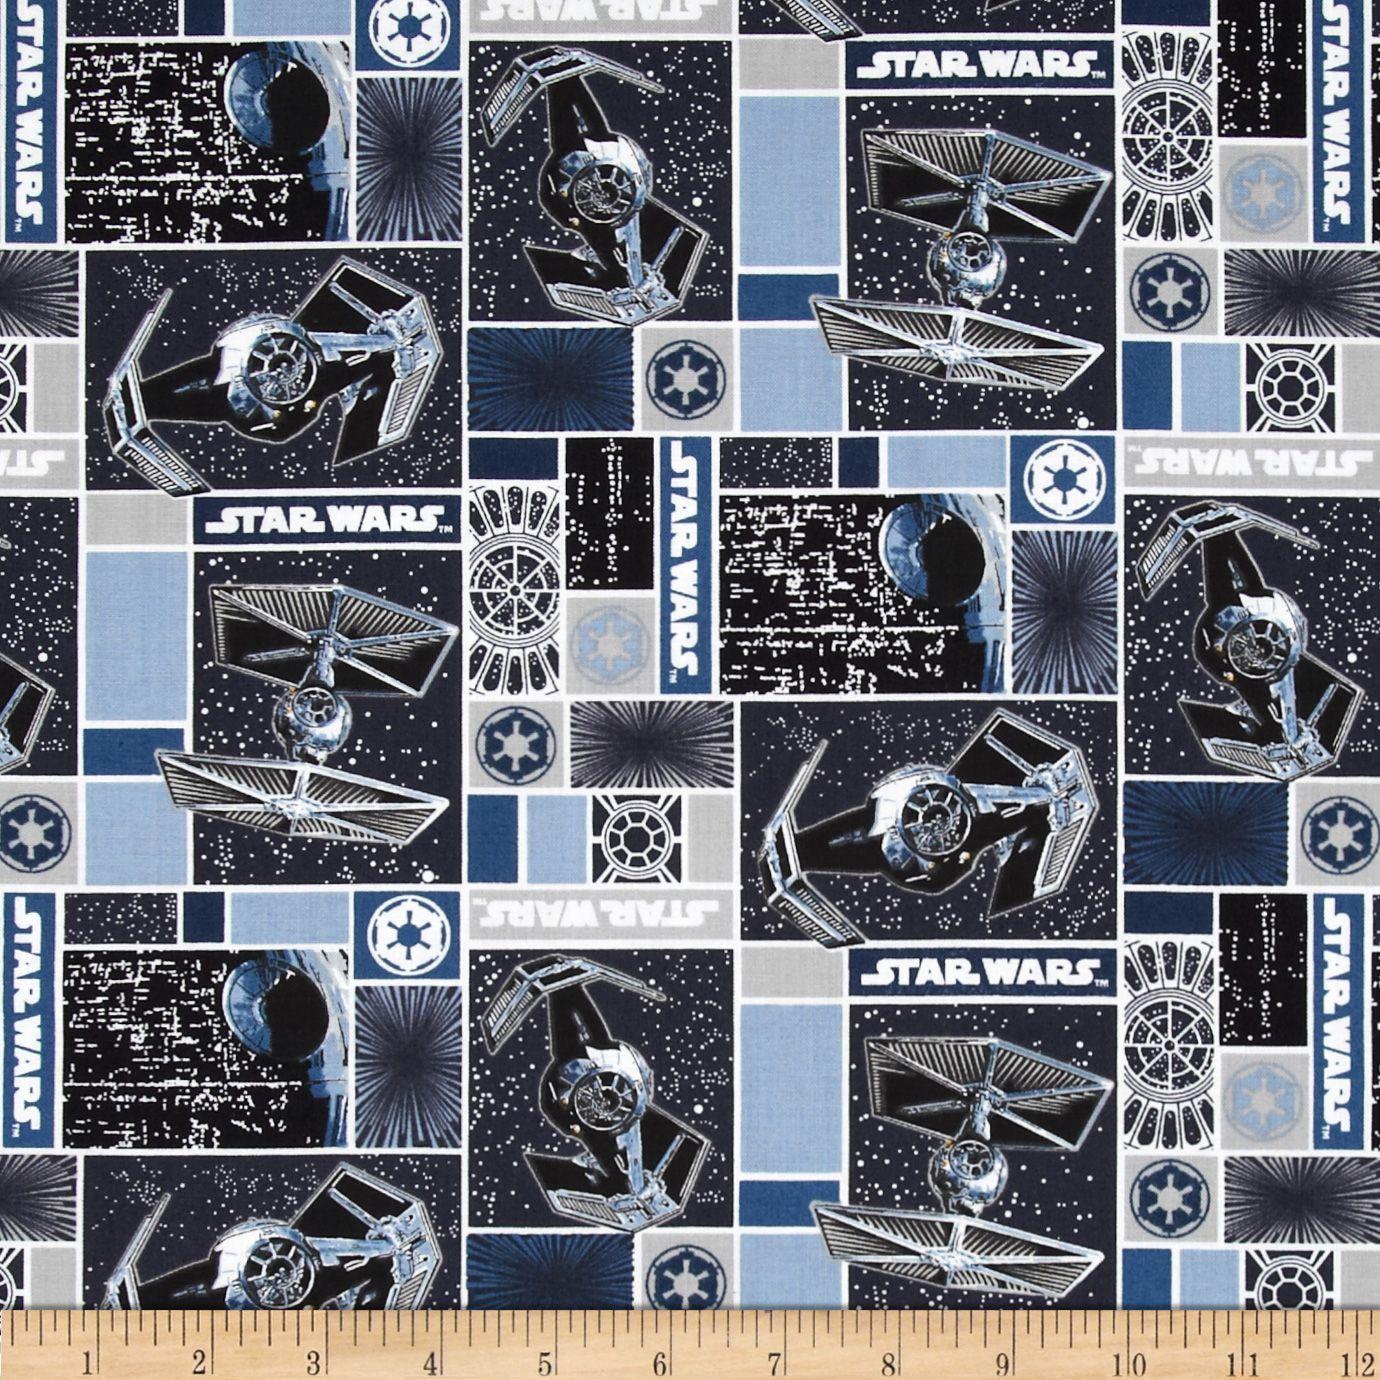 Star Wars Imperial Ships Fabric | Fabulous Fabrics | Pinterest